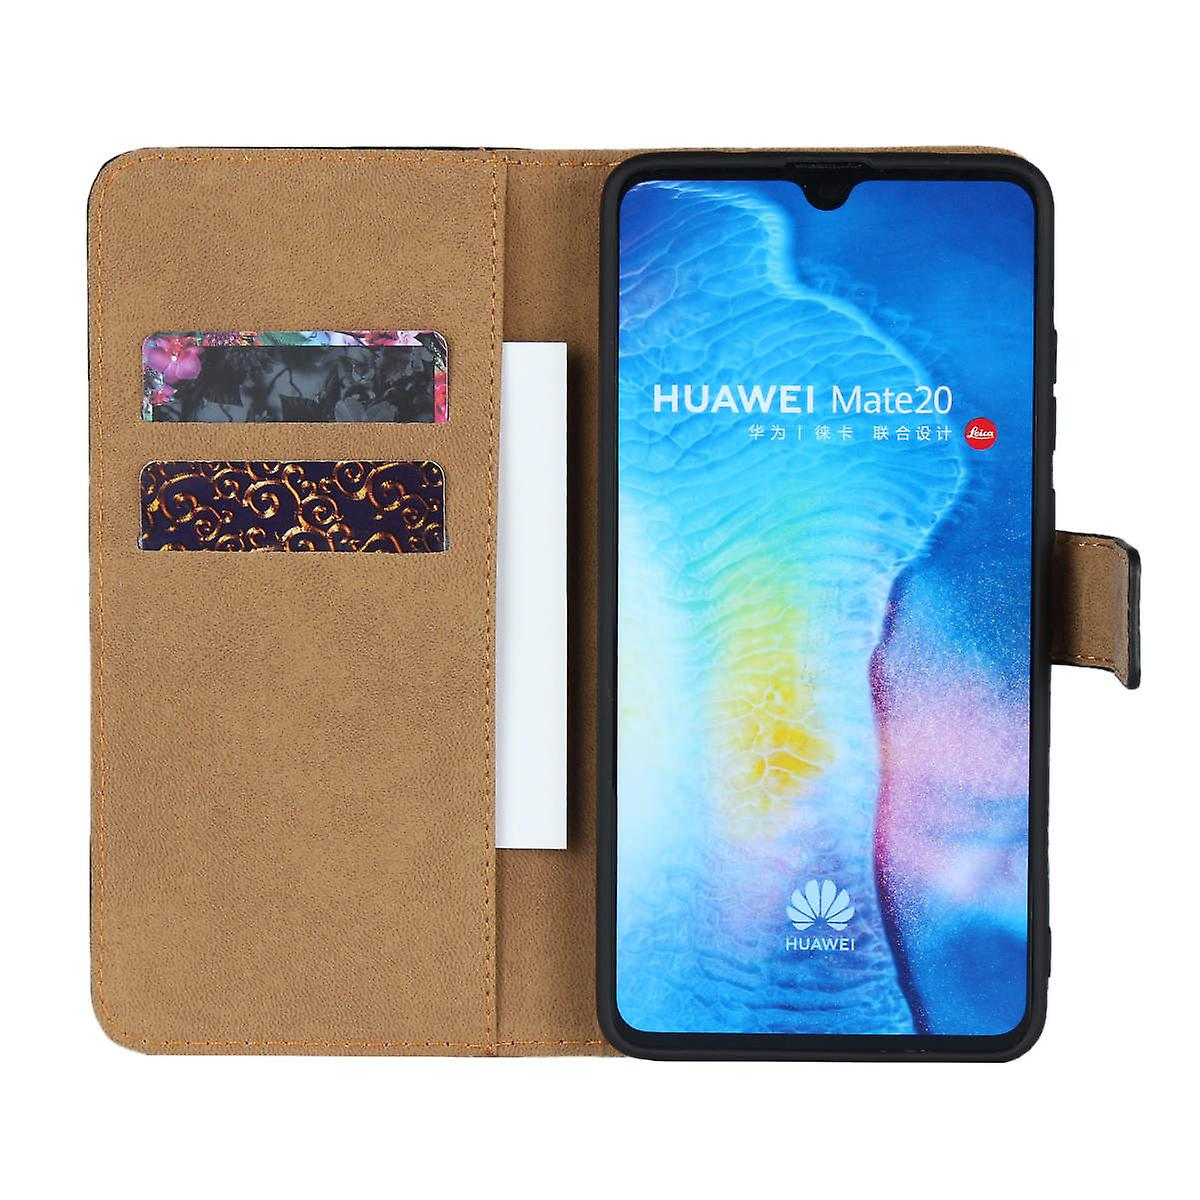 iCoverCase | Huawei Mate 20 | Plånboksfodral